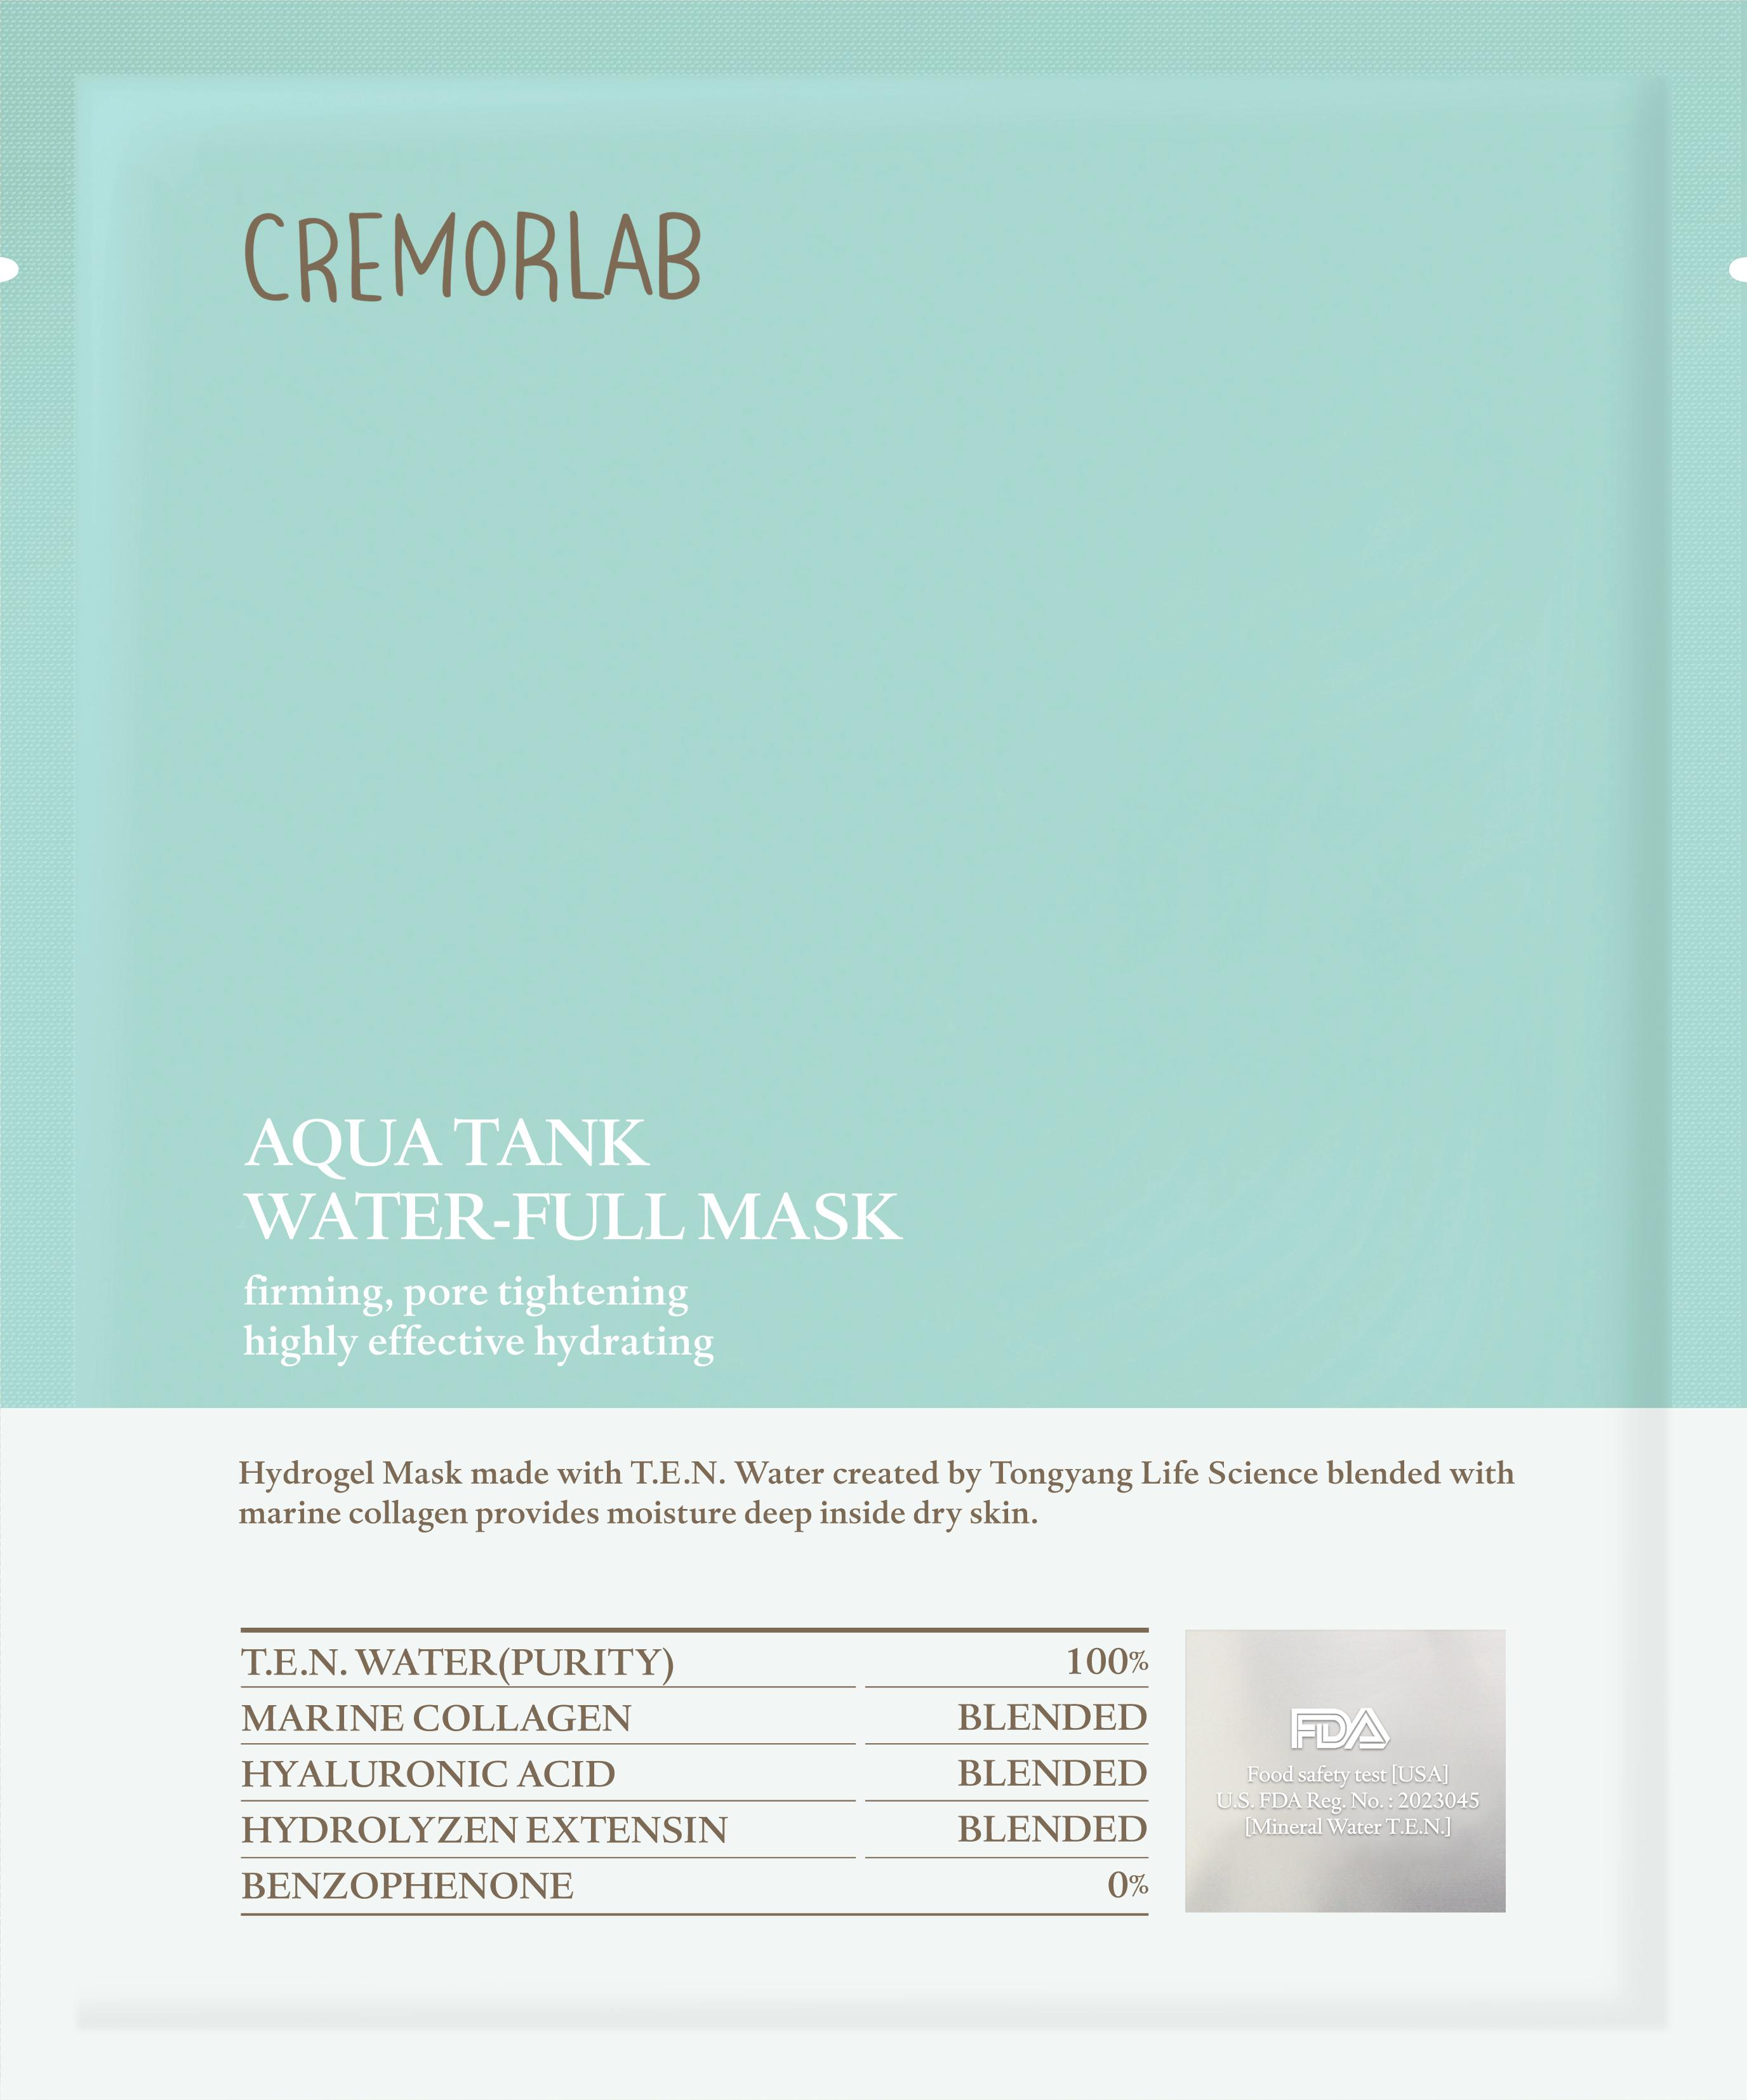 Cremorlab Cremorlab Aqua Tank Cremorlab Cremorlab Aqua Tank Water-full Mask Ansi 90573475